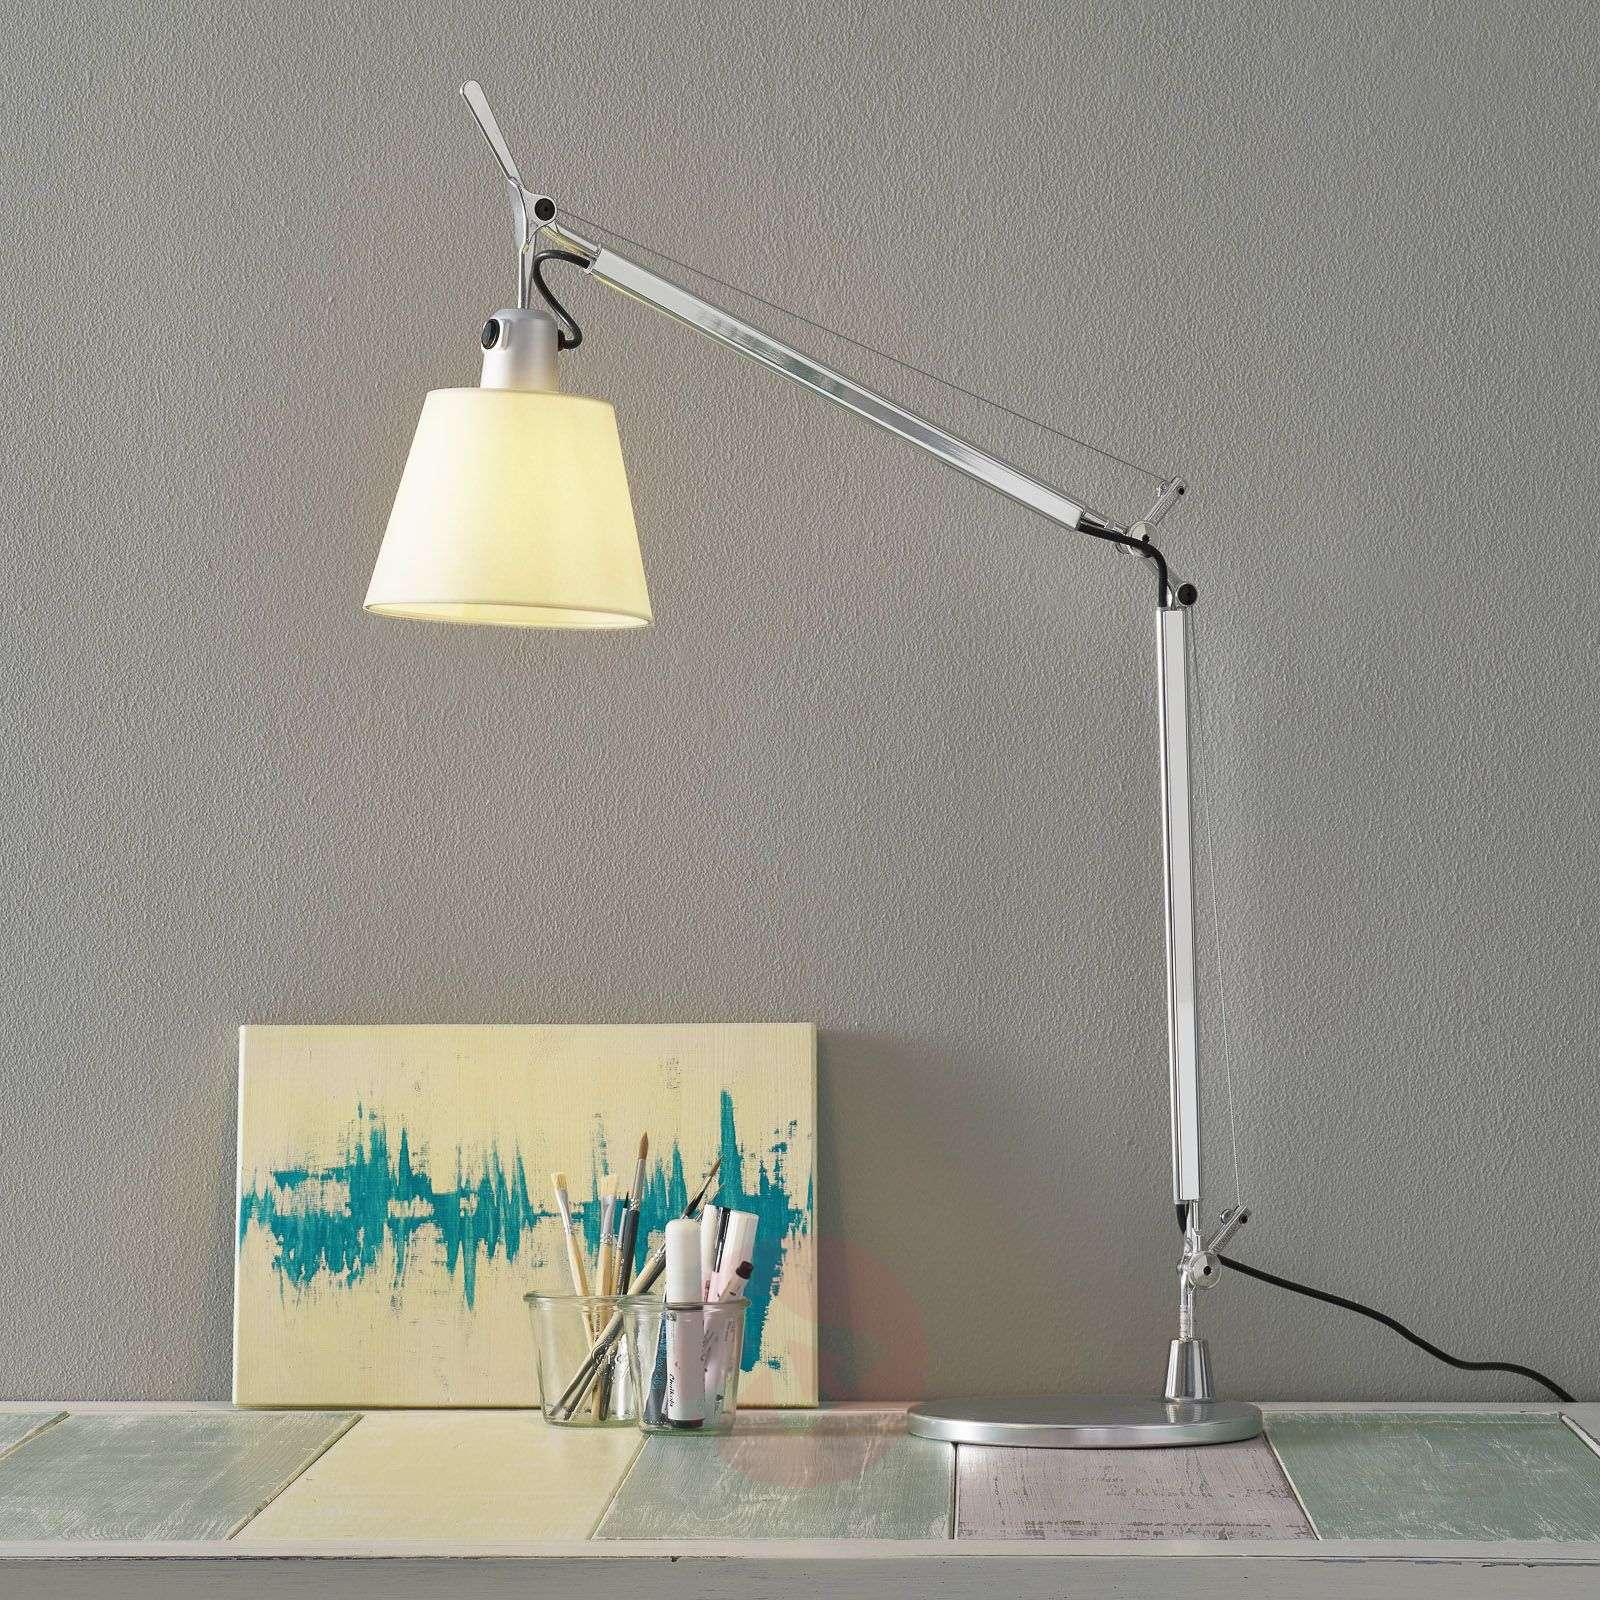 Design-pöytävalaisin Tolomeo Basculante-1060089-02